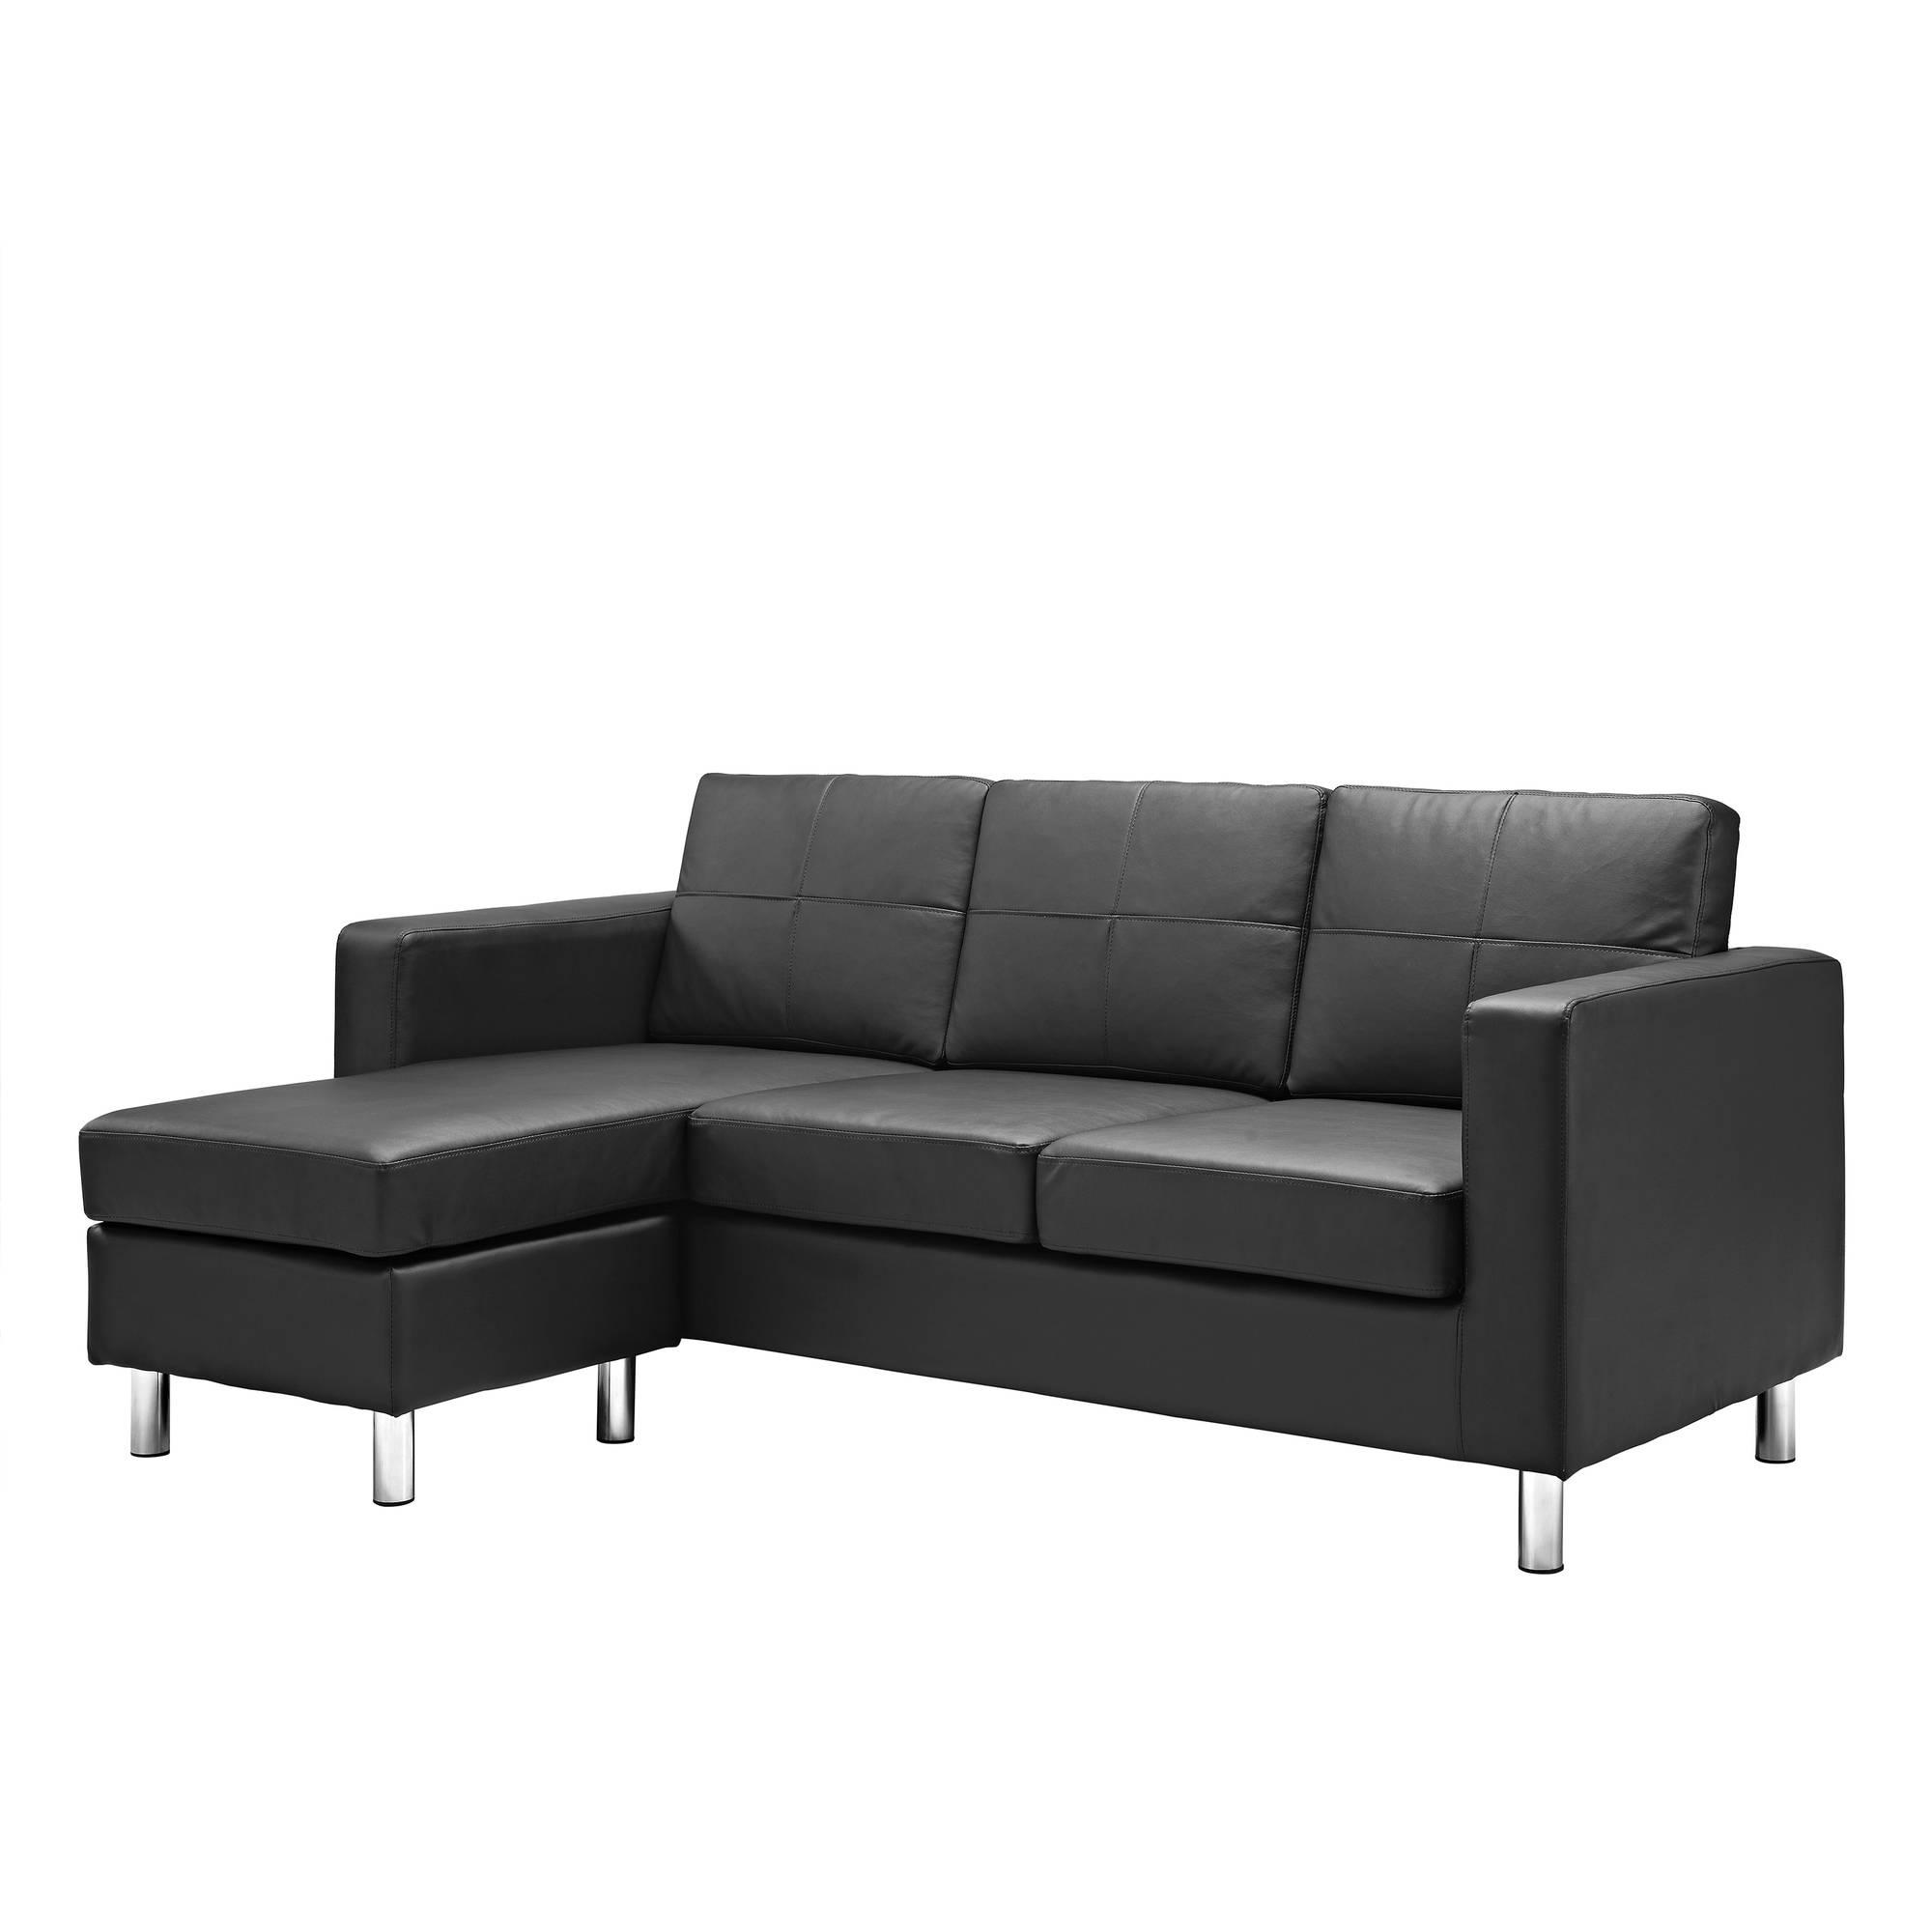 small sectional sofa dorel living small spaces configurable sectional sofa, multiple colors -  walmart.com ZEPJHRJ